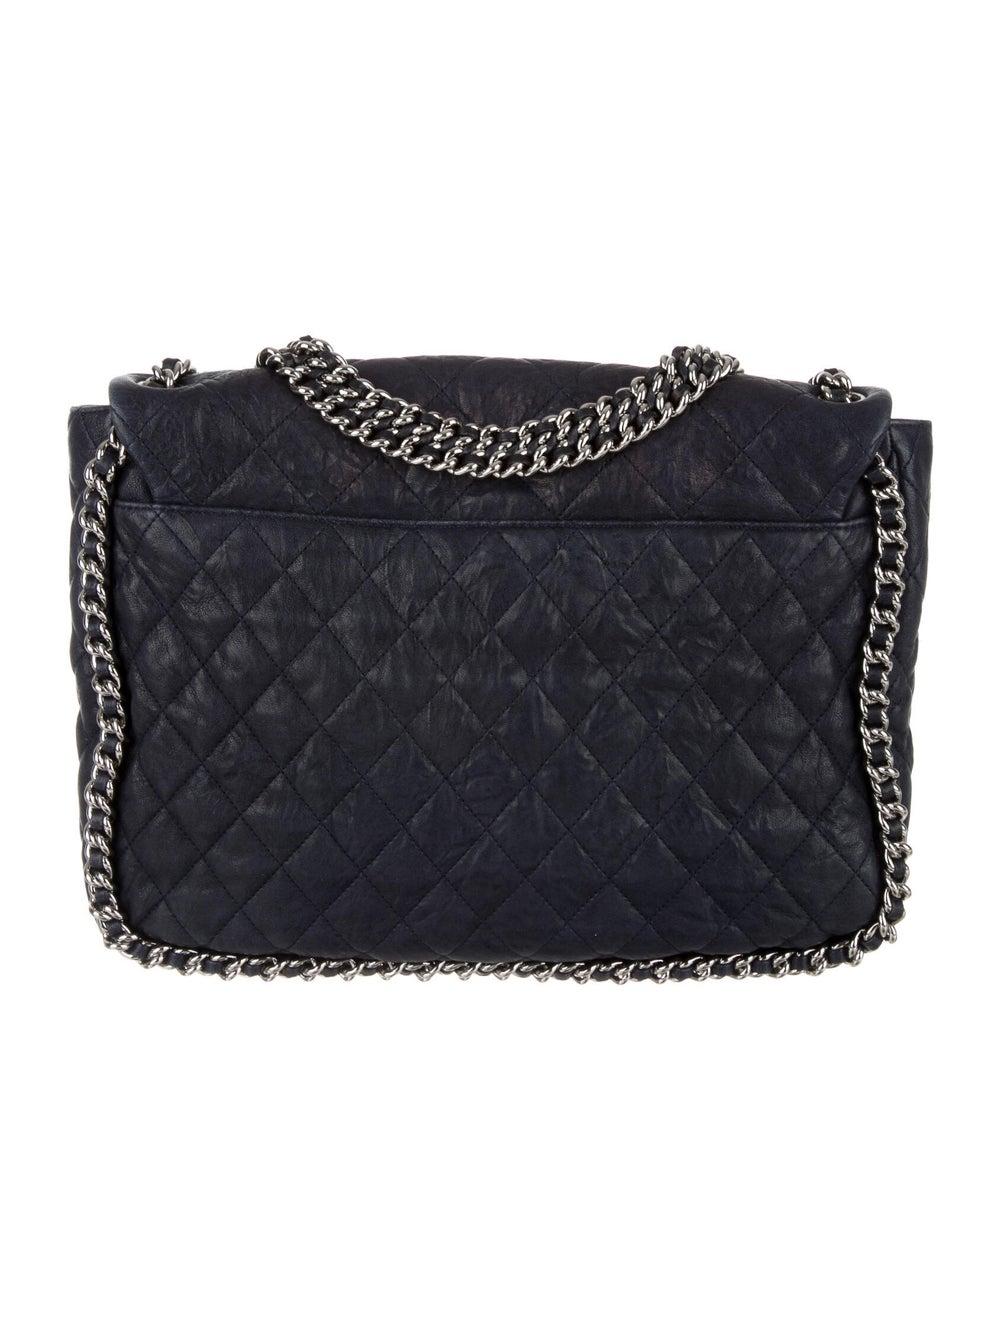 Chanel Maxi Chain-Around Flap Bag Blue - image 4